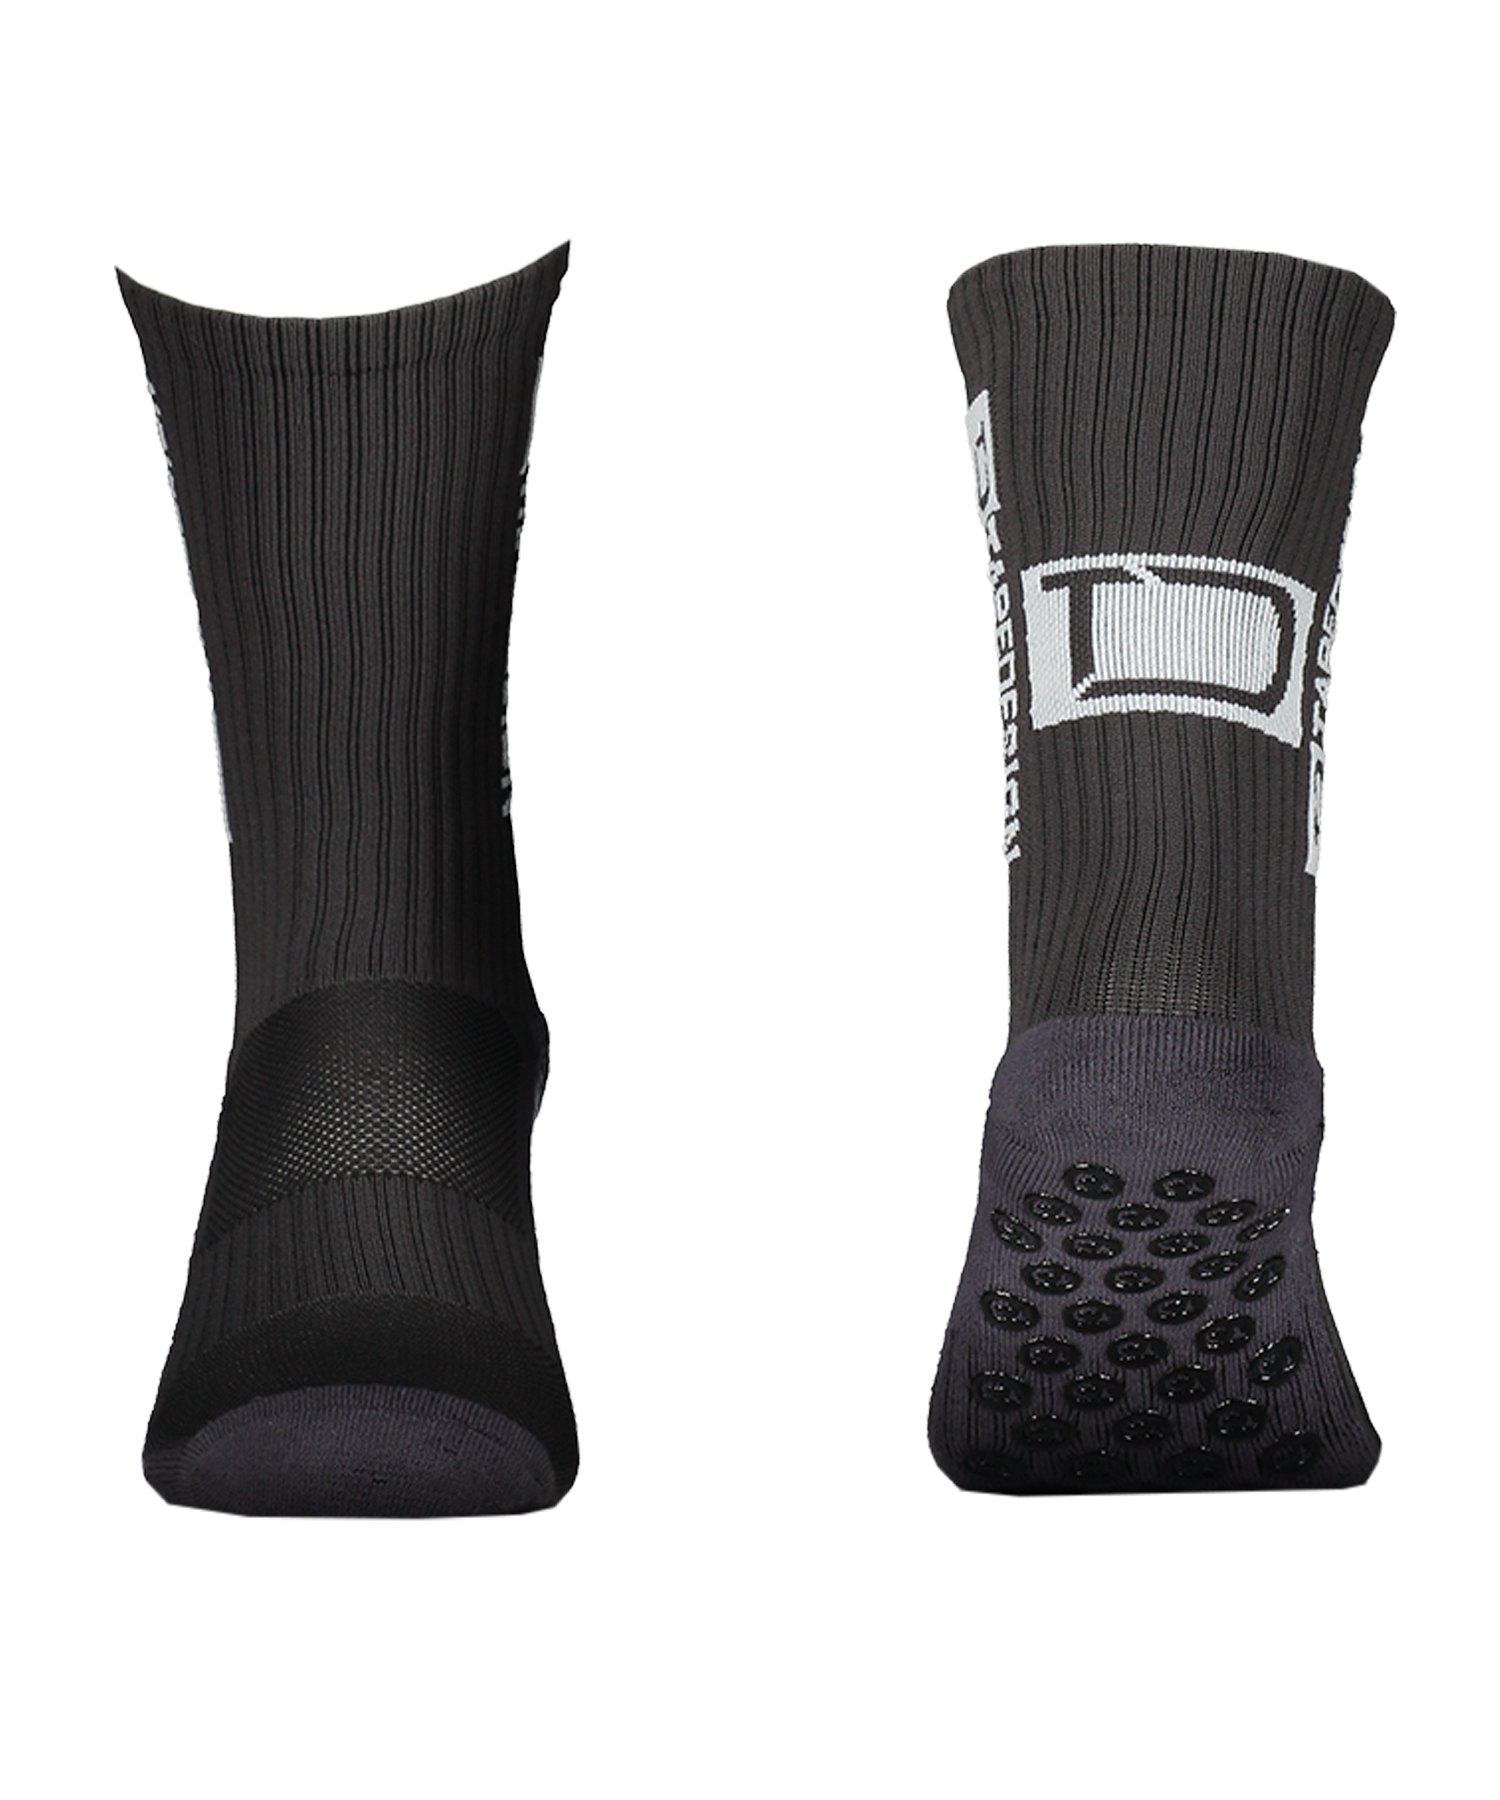 Tapedesign Socks Socken Dunkelgrau F016 - grau